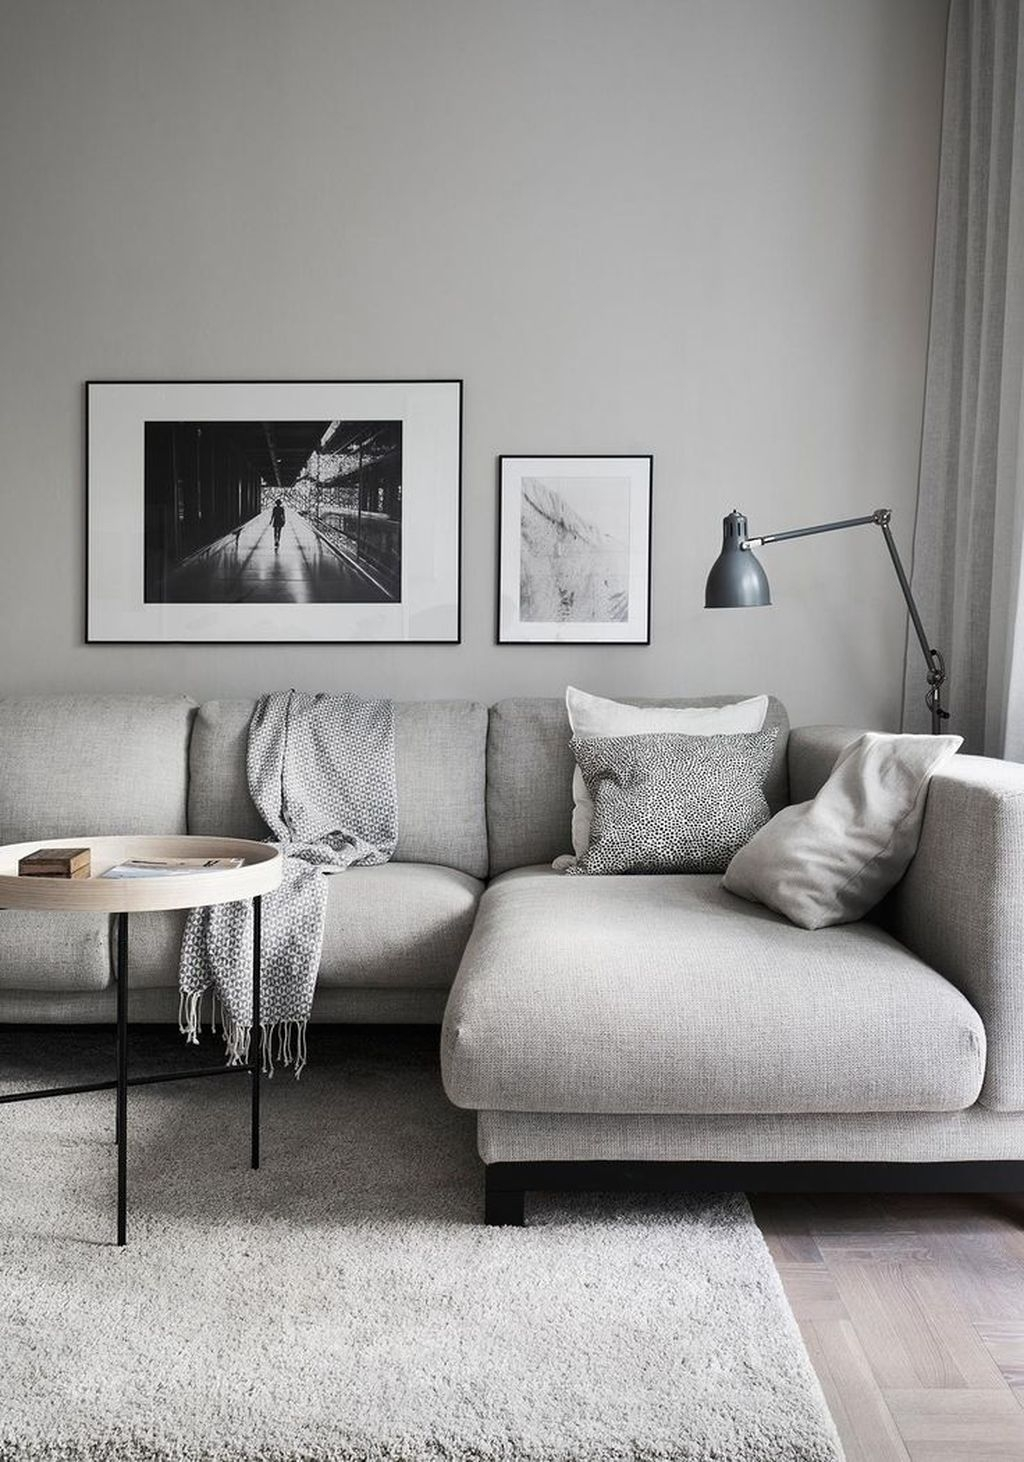 Awesome Modern Minimalist Home Decor Ideas 13